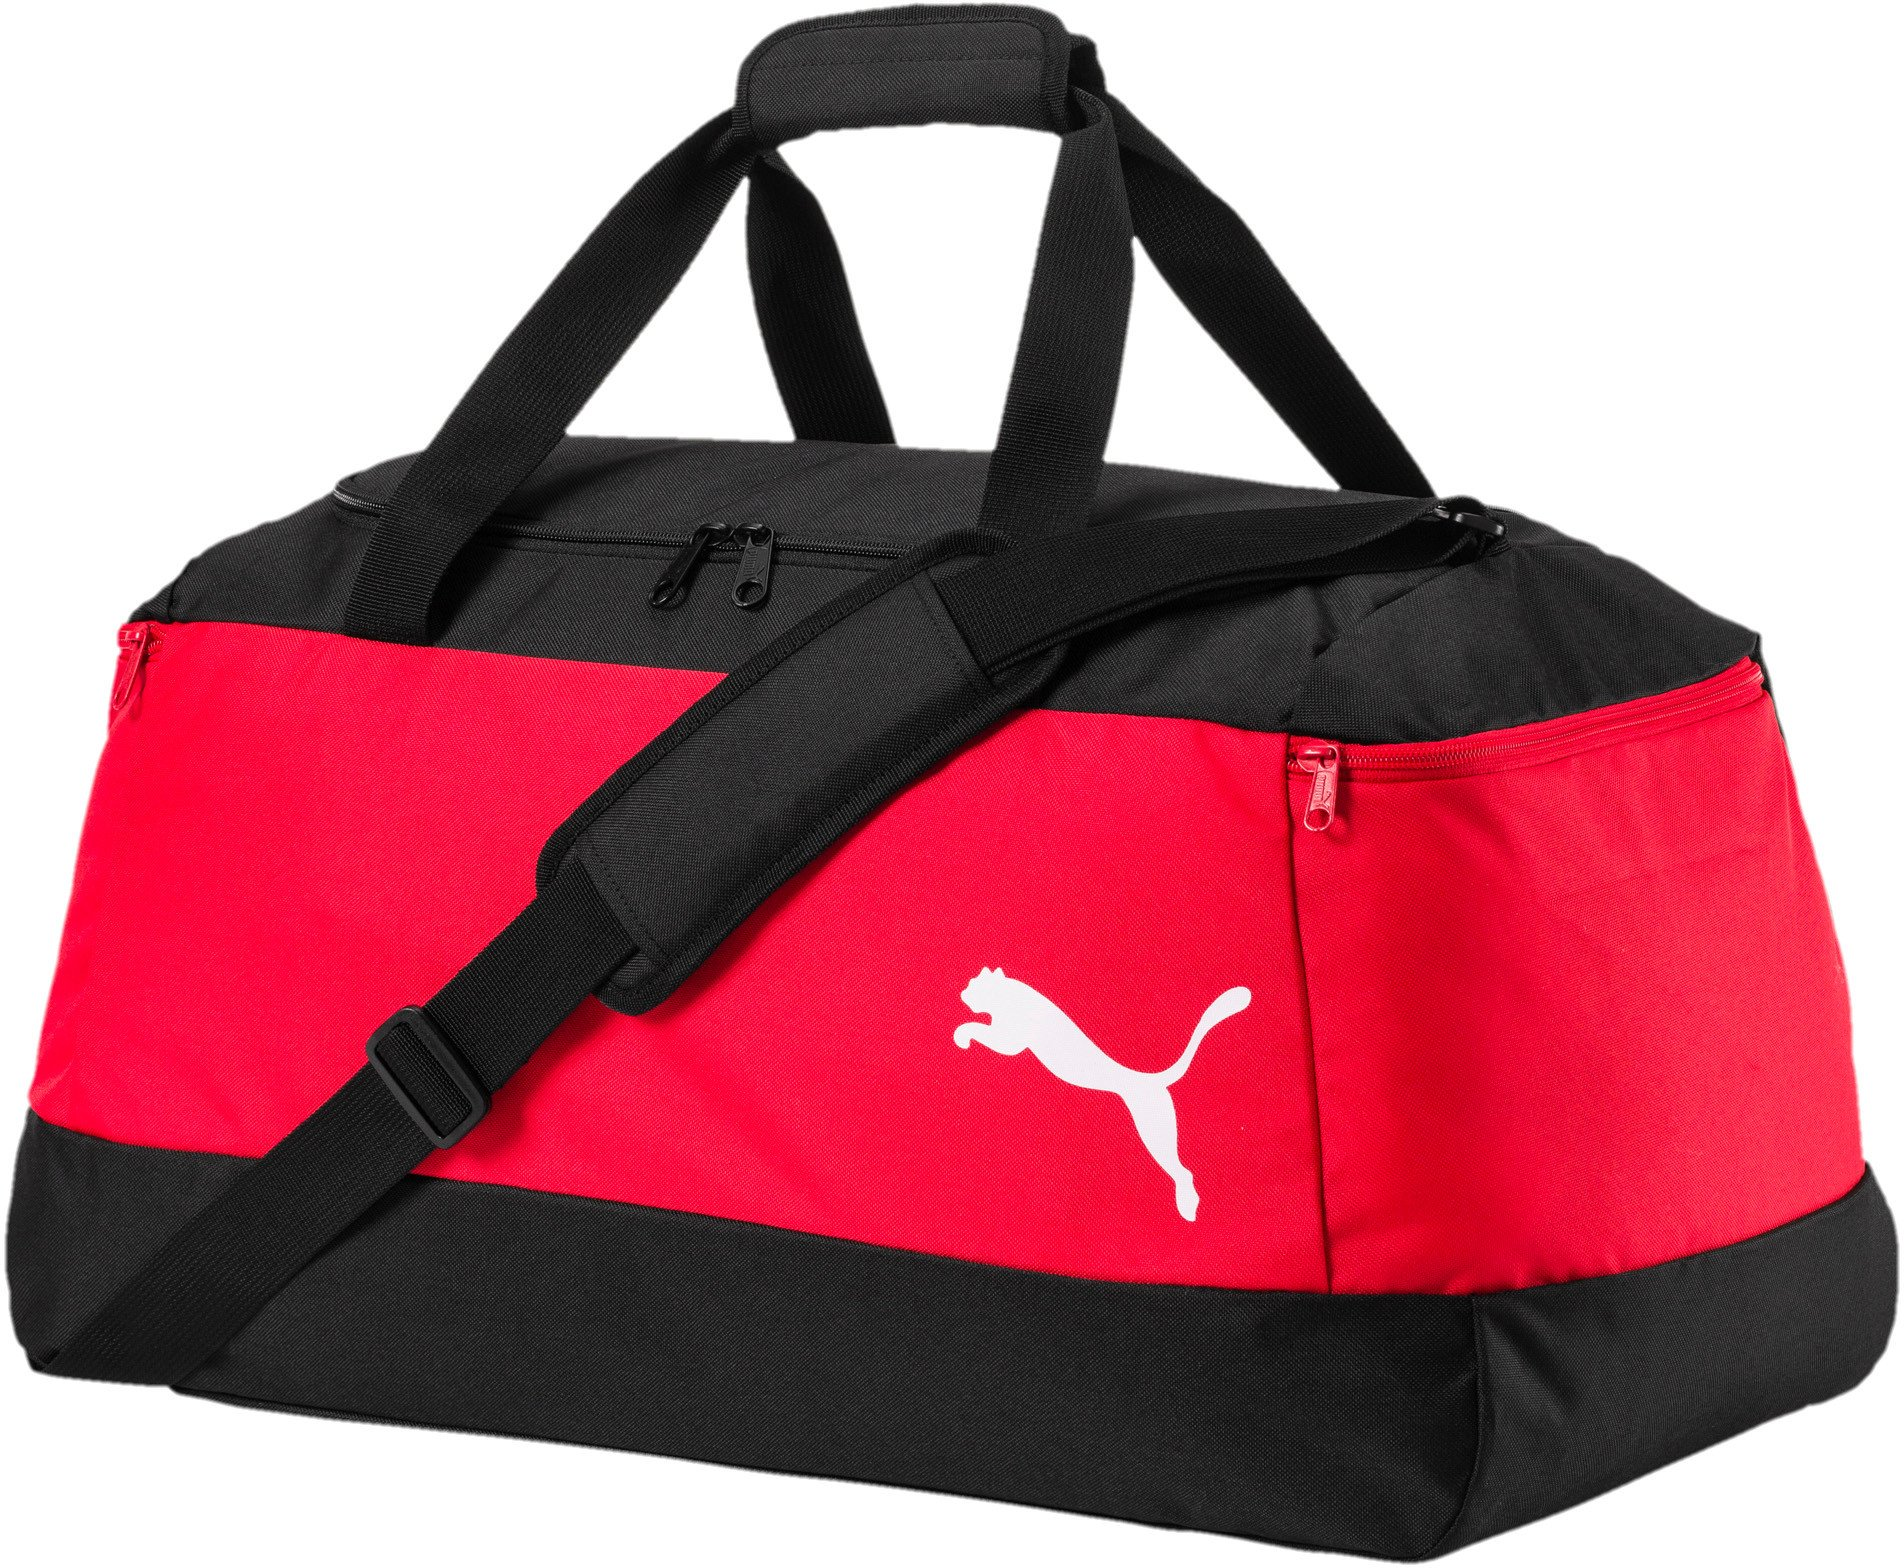 Taška střední velikosti Puma Pro Training II Medium